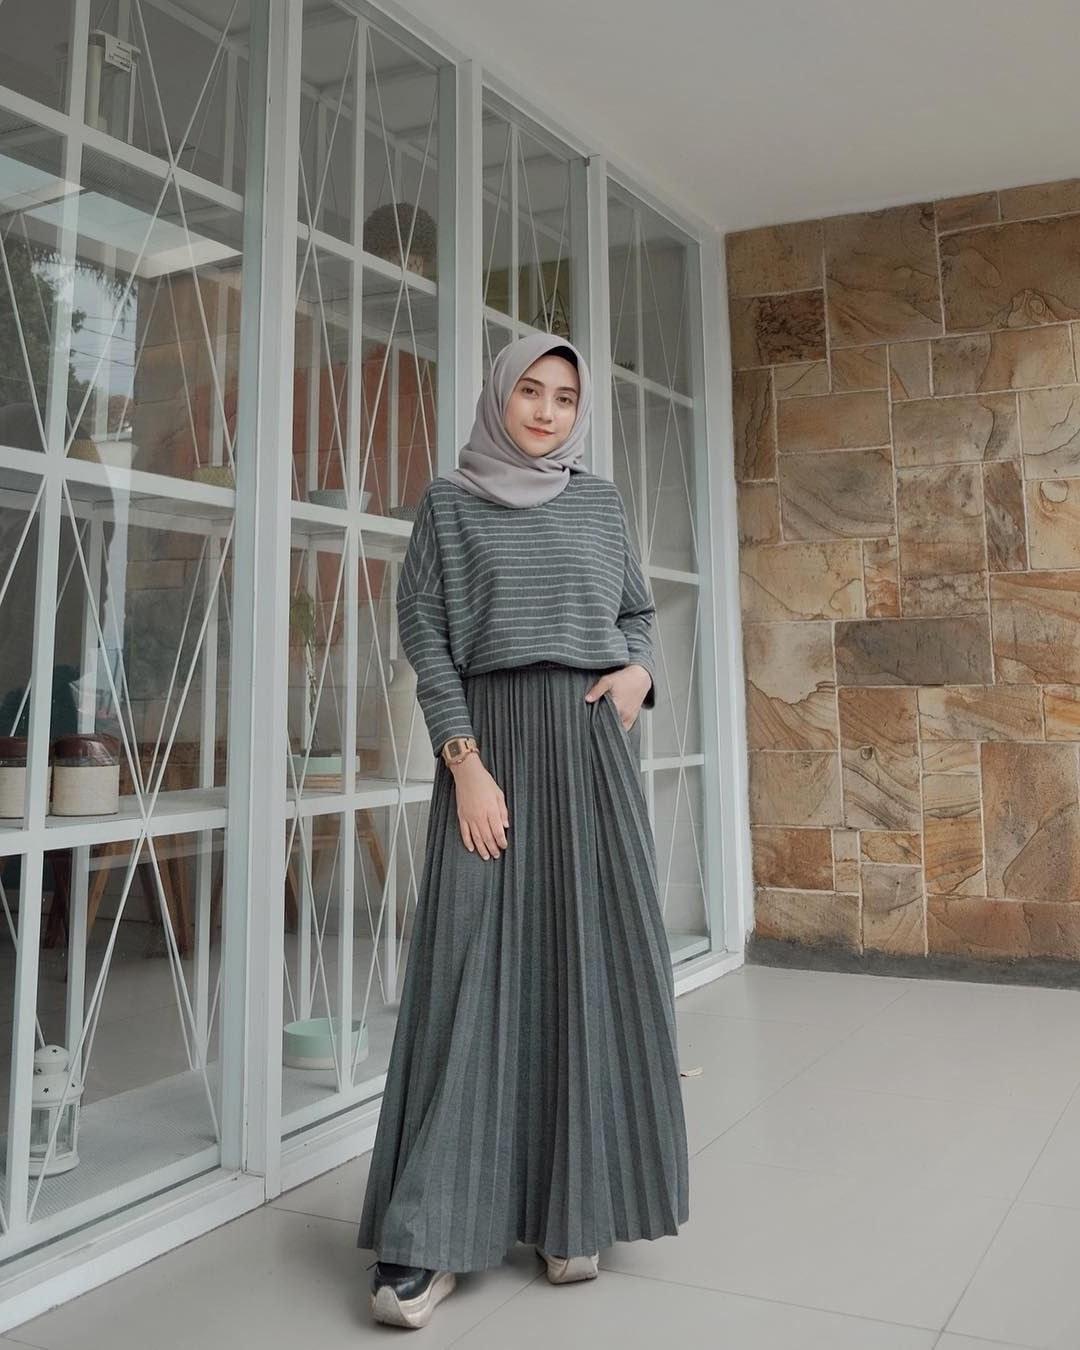 Model Baju Lebaran Remaja Terbaru 2020 Whdr Baju Muslim Lebaran Terbaru 2019